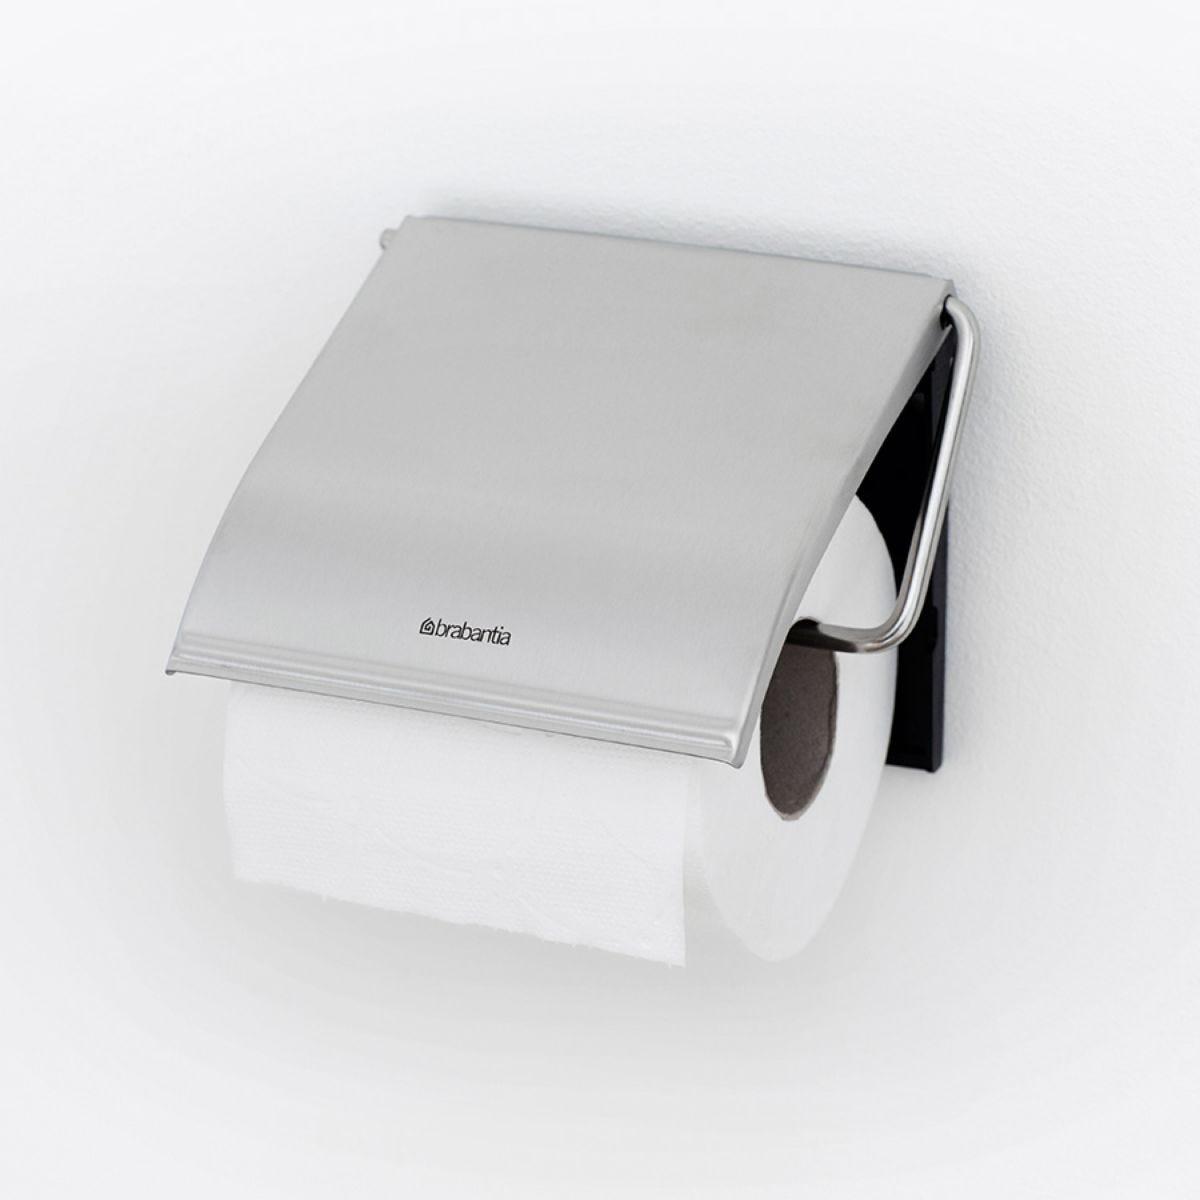 Brabantia Toilet Roll Holder - Matt Steel